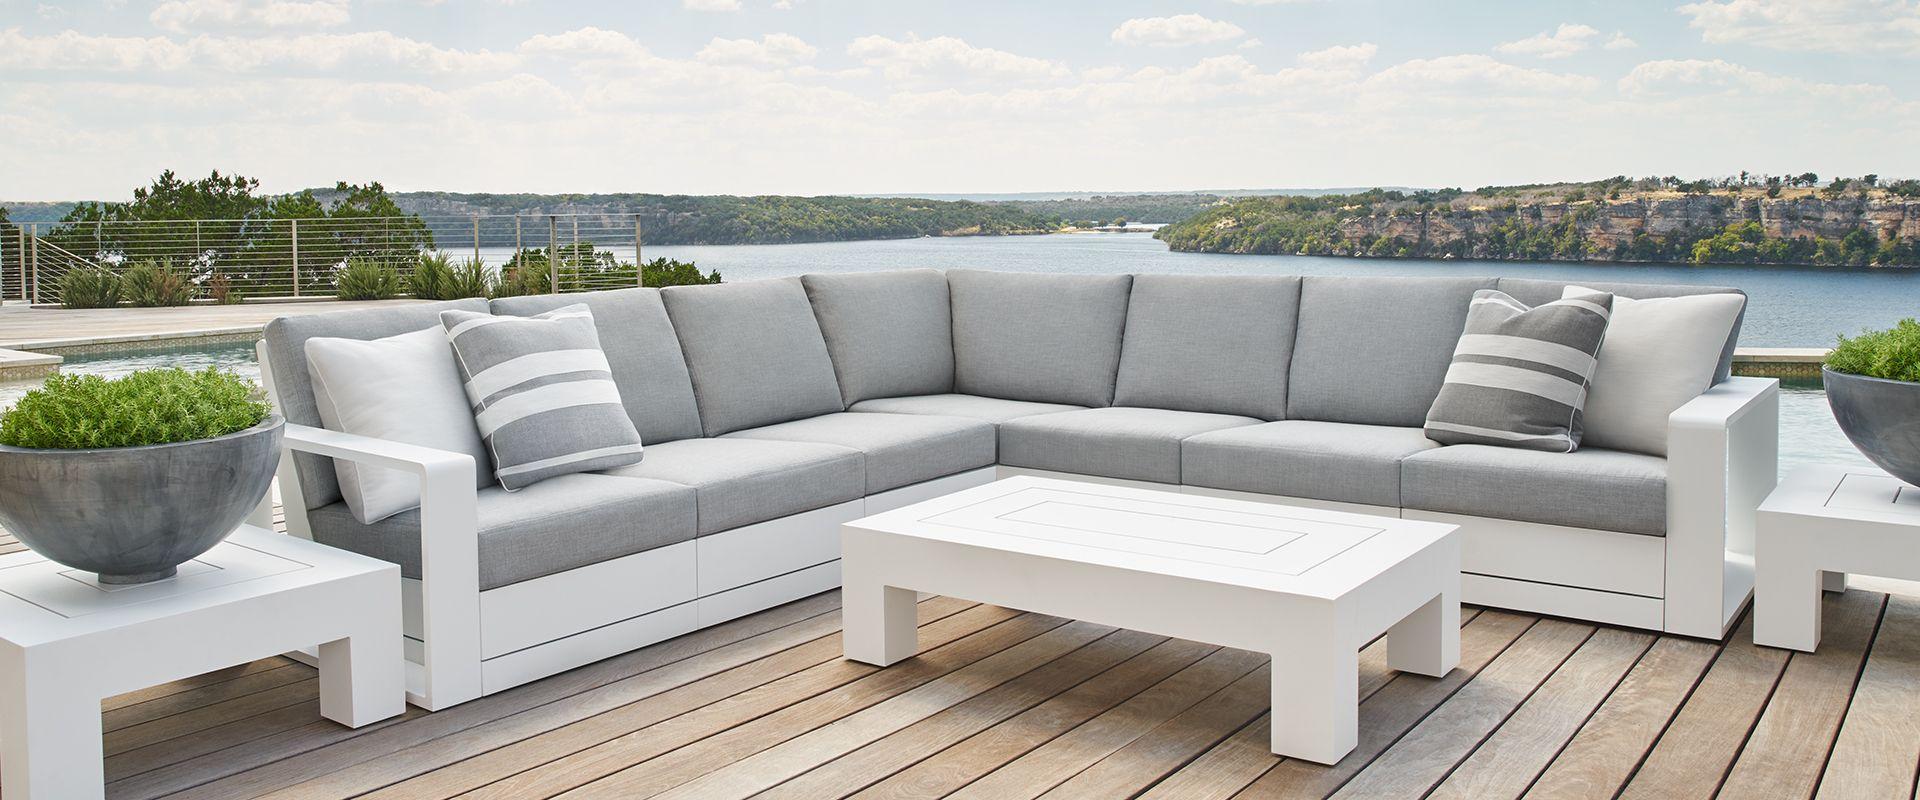 Elegant Sutherland Furniture | Luxury Outdoor Furniture And Indoor Accessories